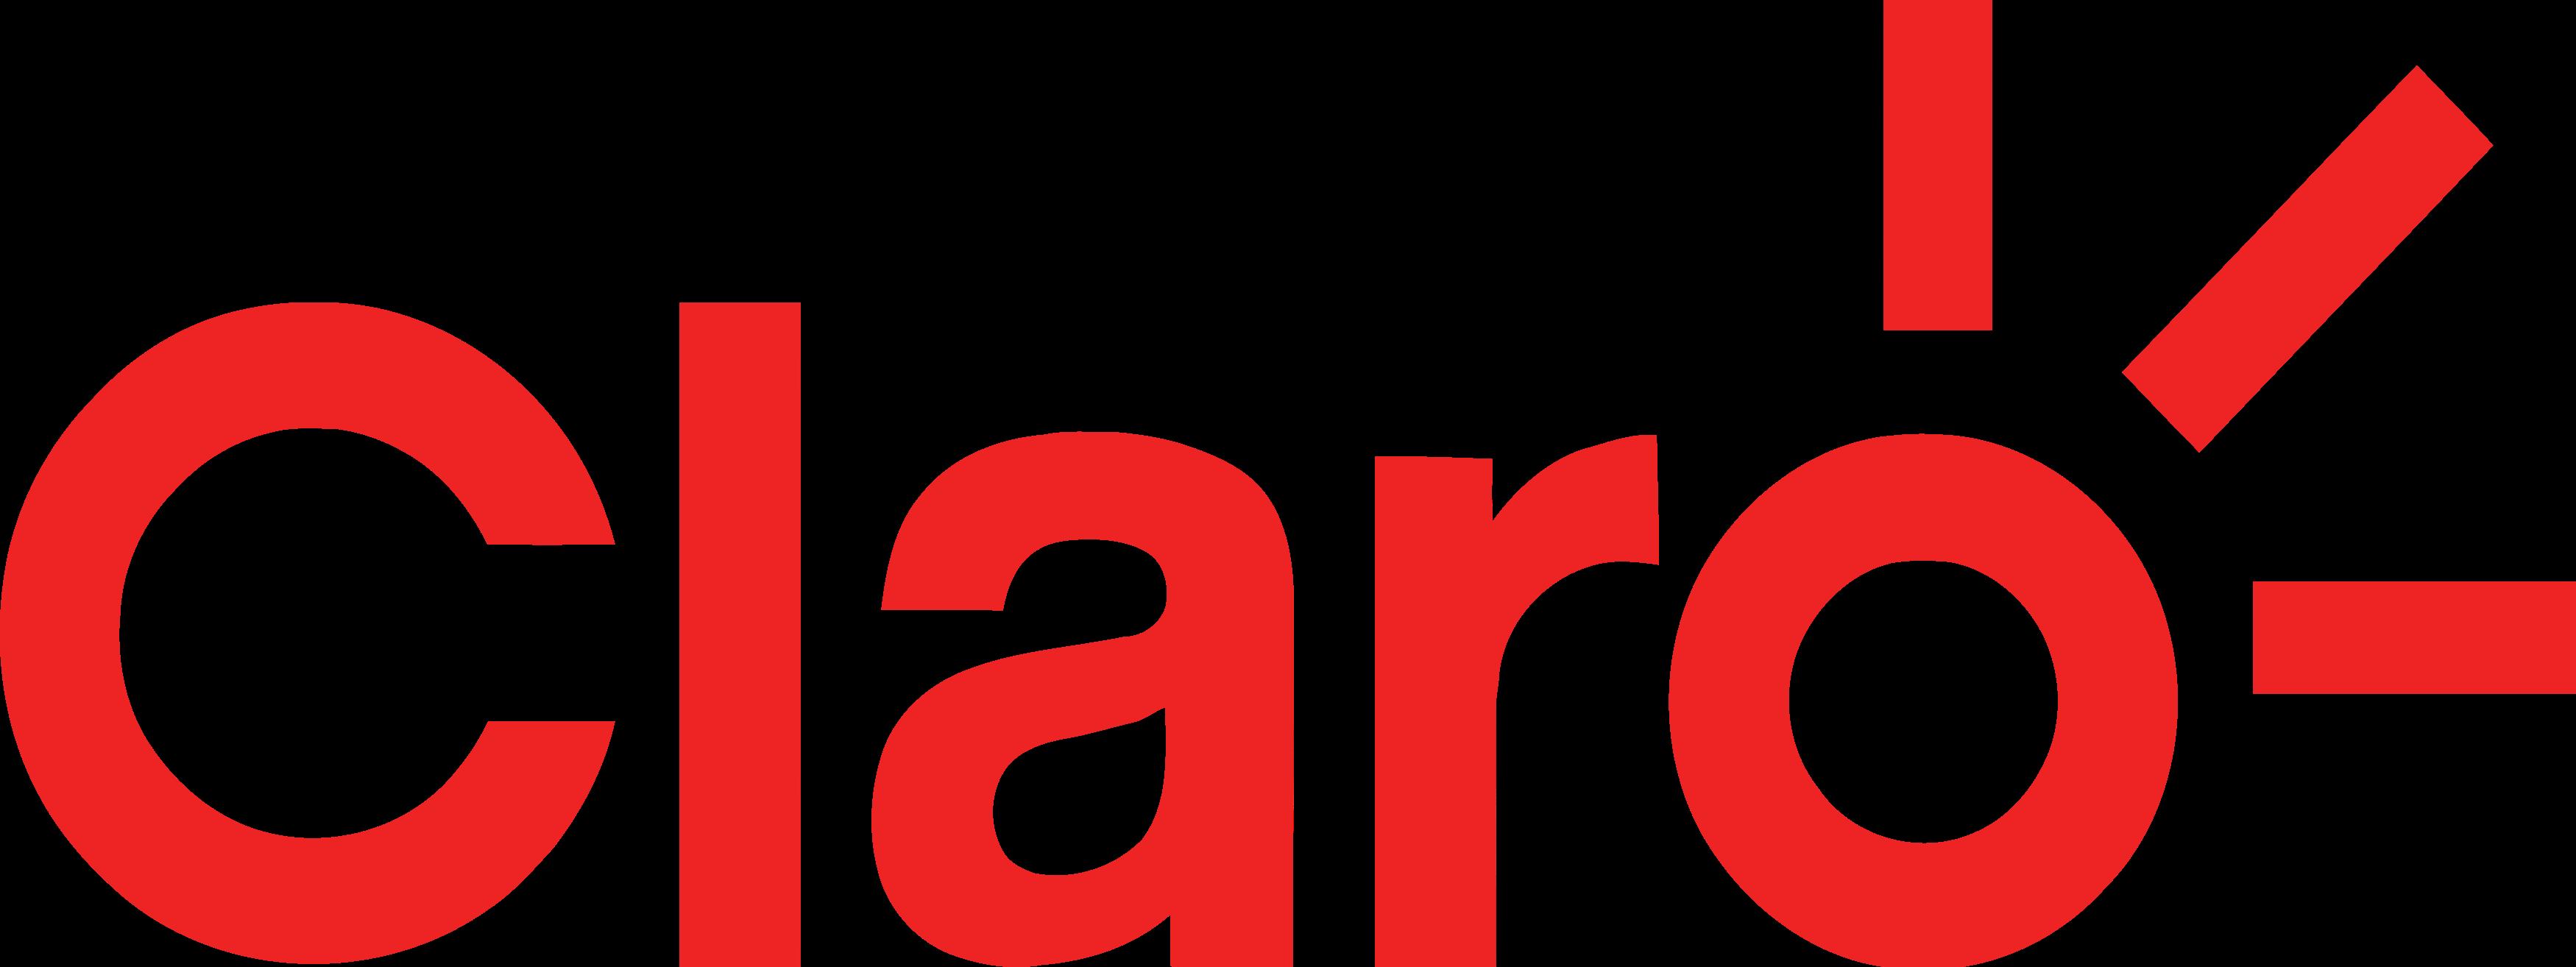 Claro Logo.